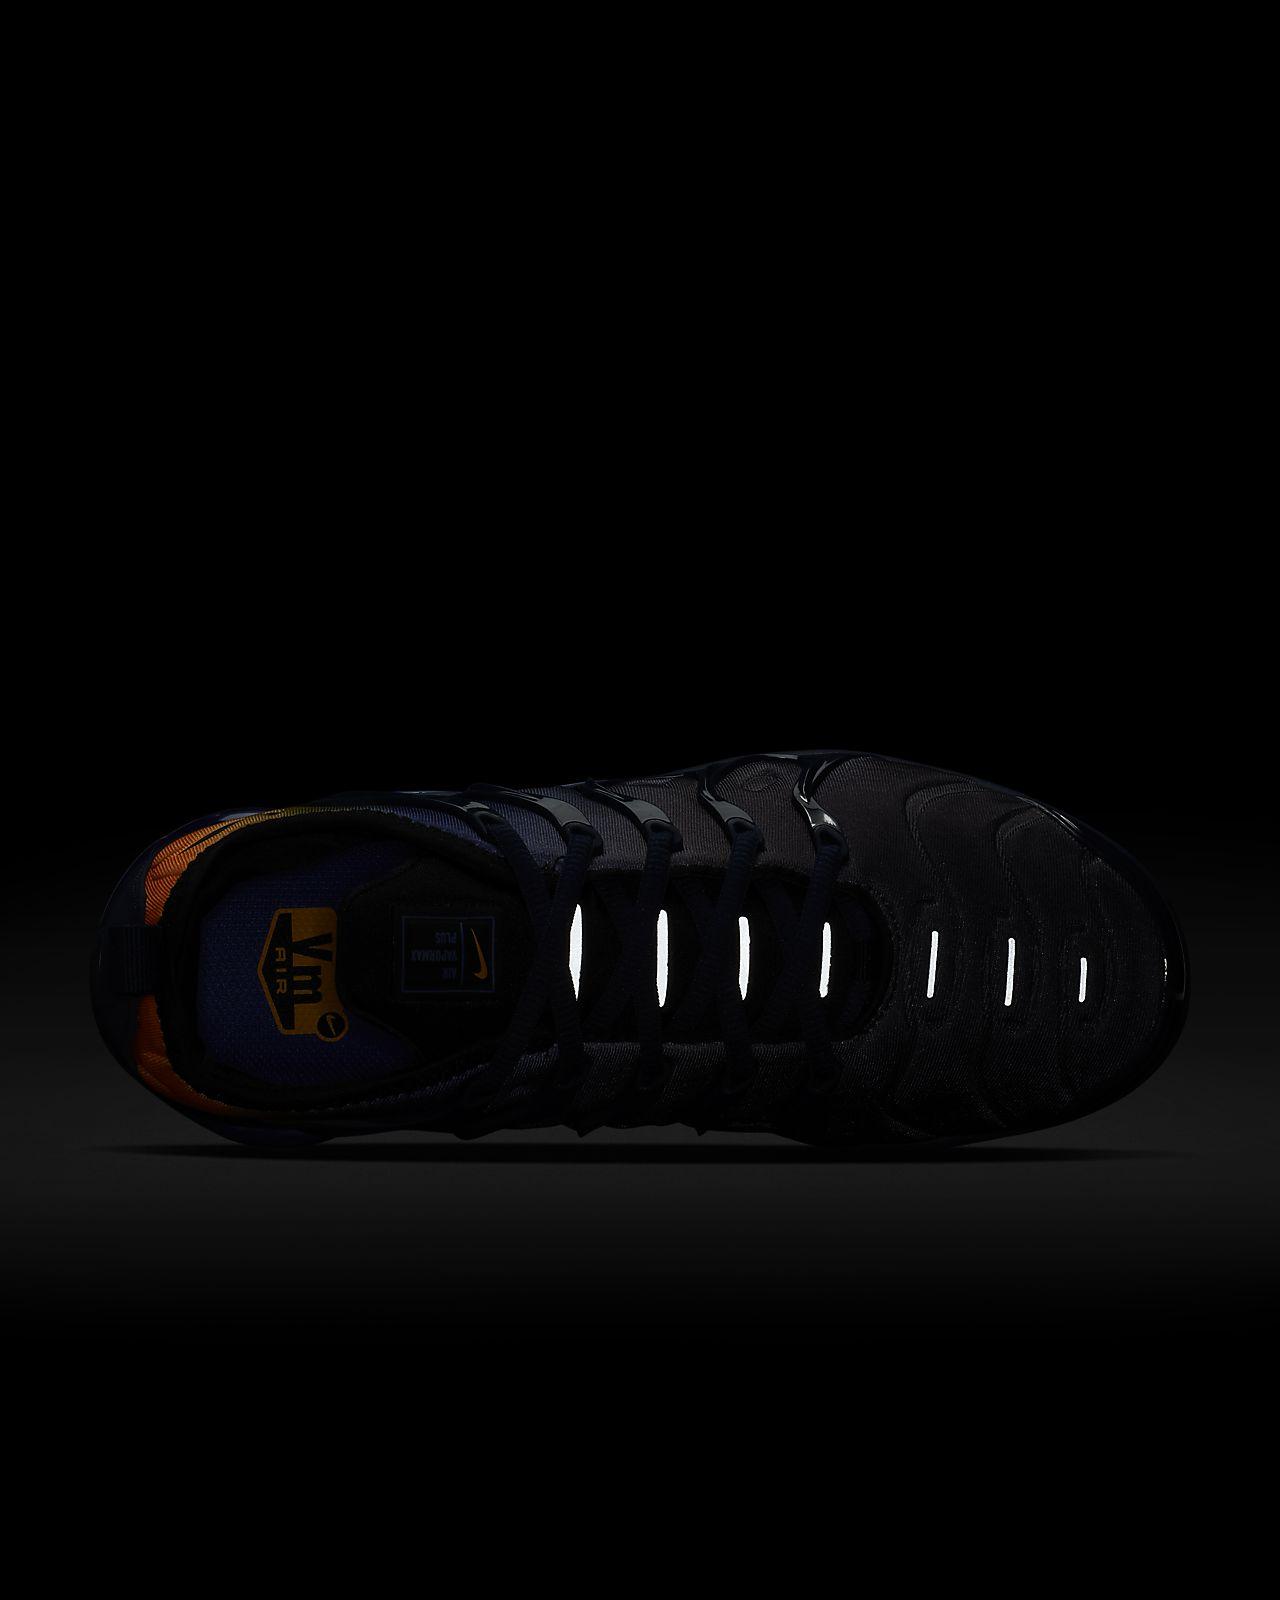 7d1d955520596 Nike Air VaporMax Plus Women s Shoe. Nike.com